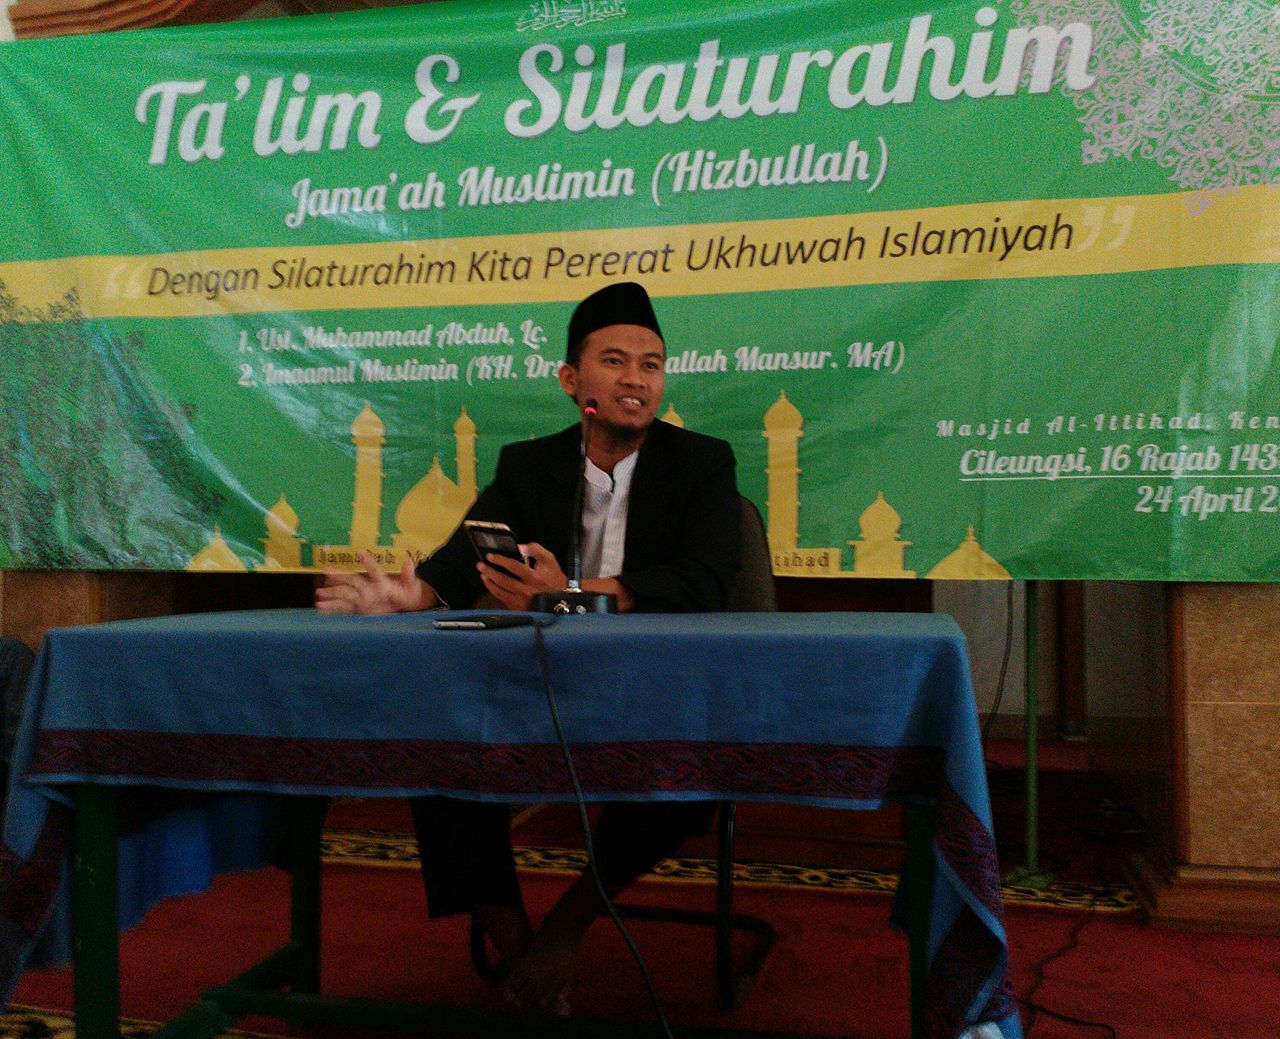 Ketua LBA: Ukhuwah Islamiyah adalah Kenikmatan